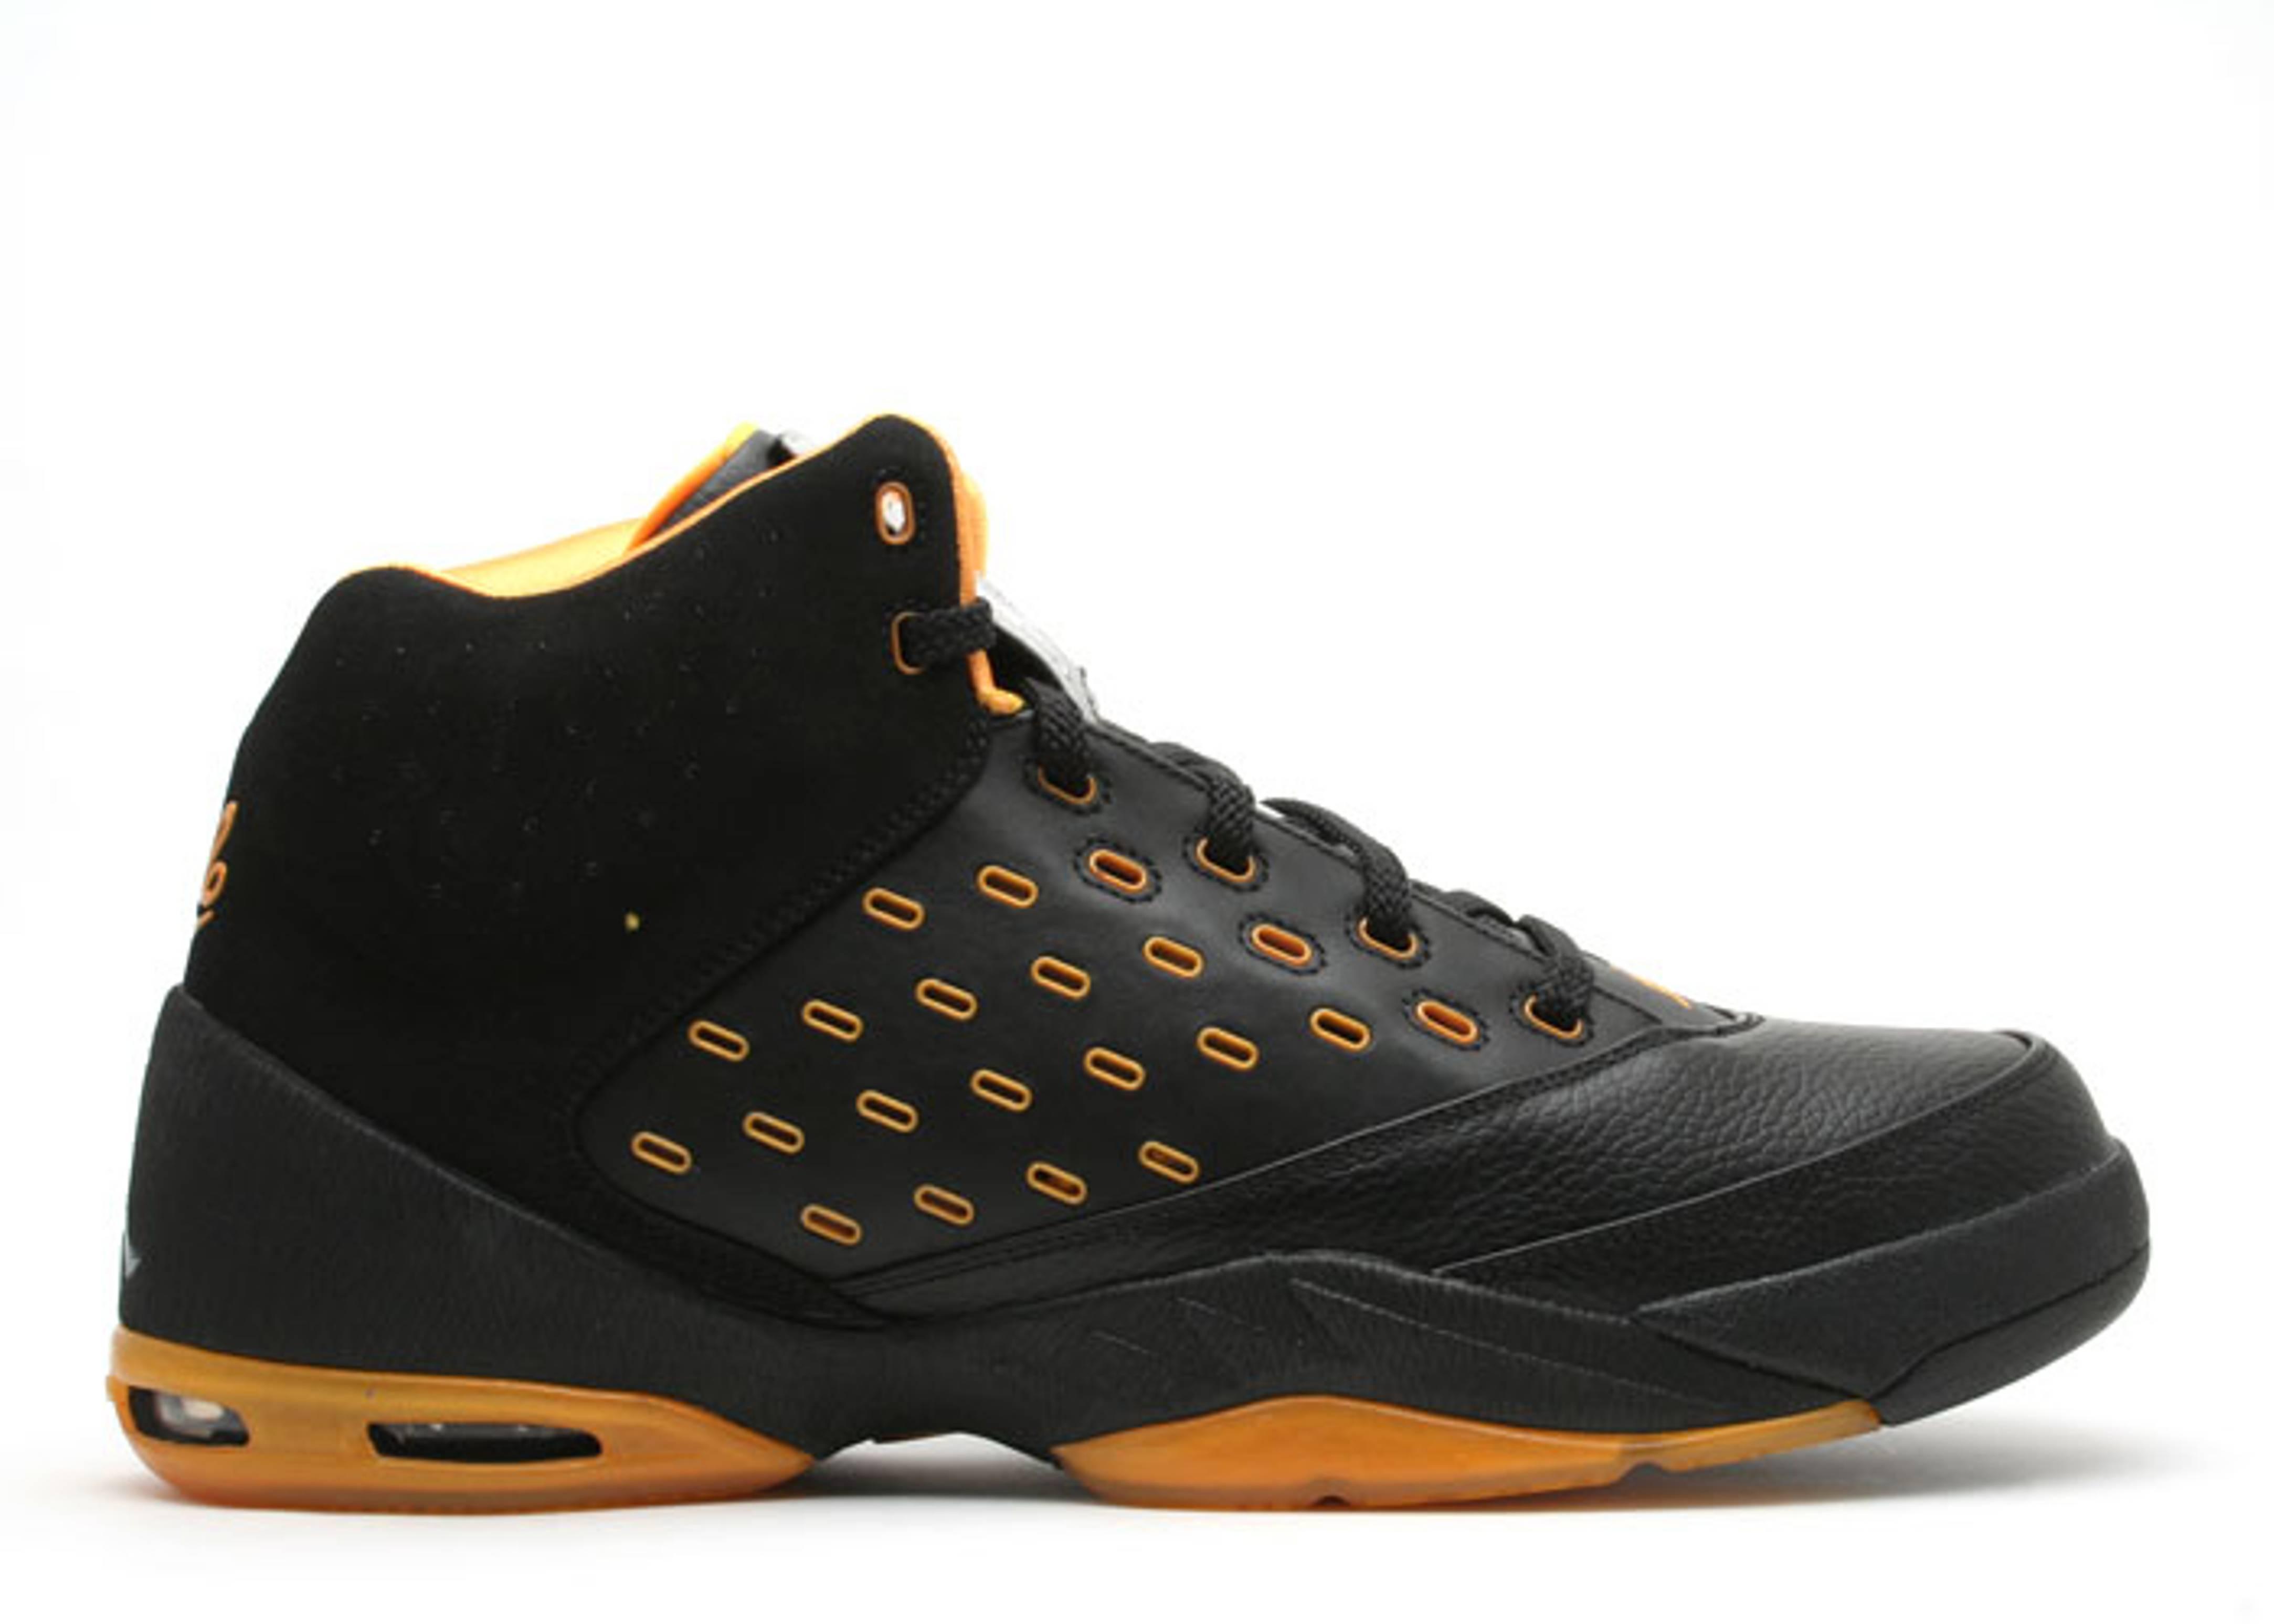 1d4cb6efcf90 ... Carmelo Anthony Air Jordan Exclusive air jordan melo 5.5 ...